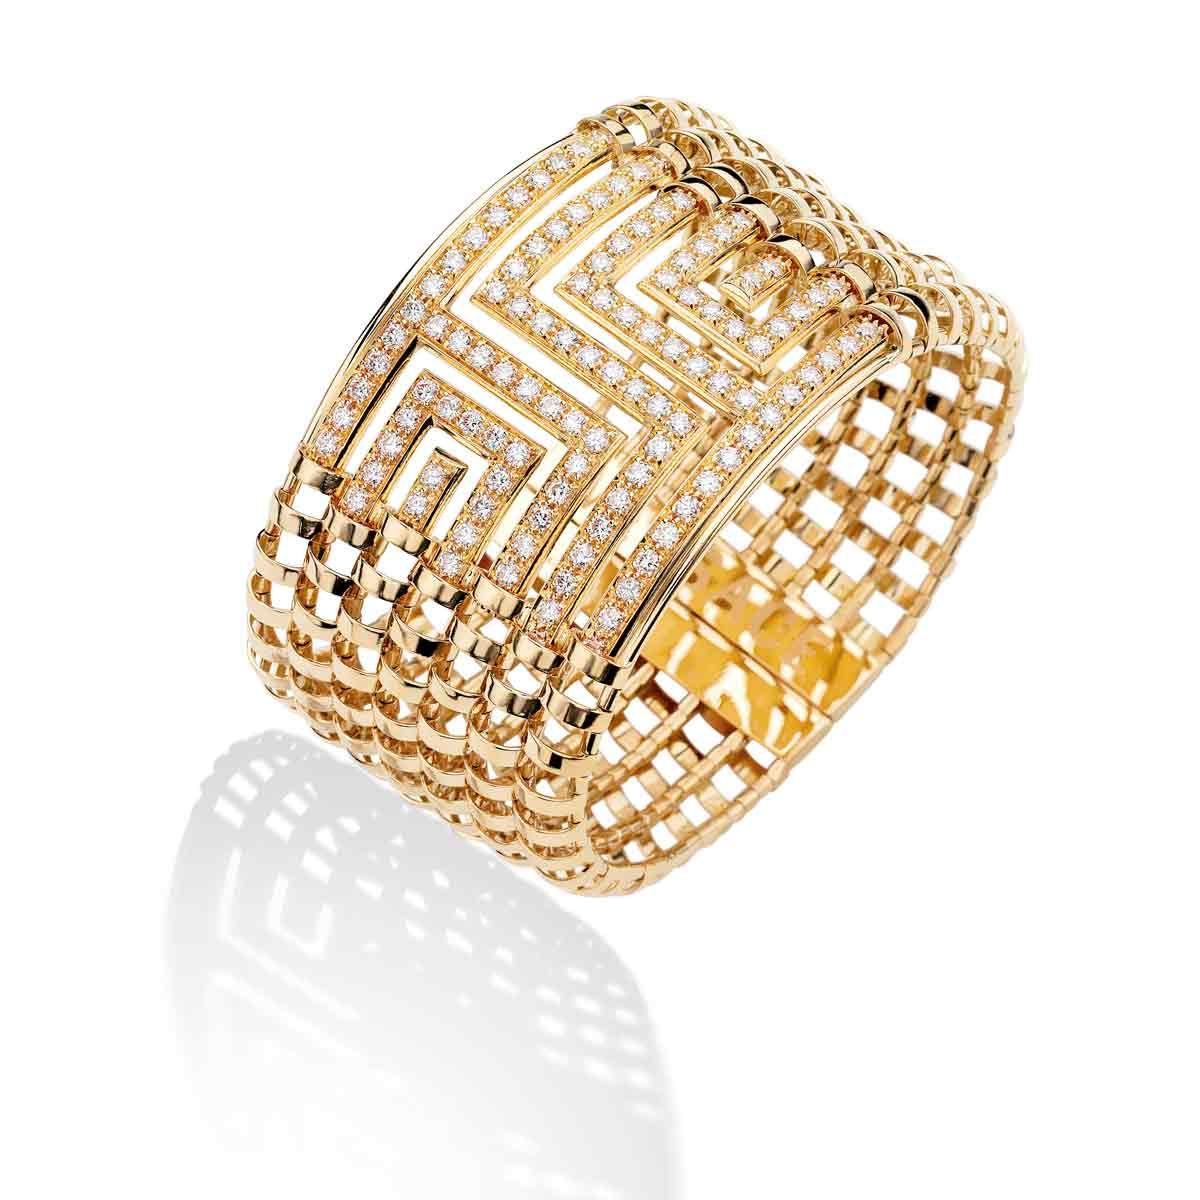 Cij international jewellery trends u colours bracelet by versace